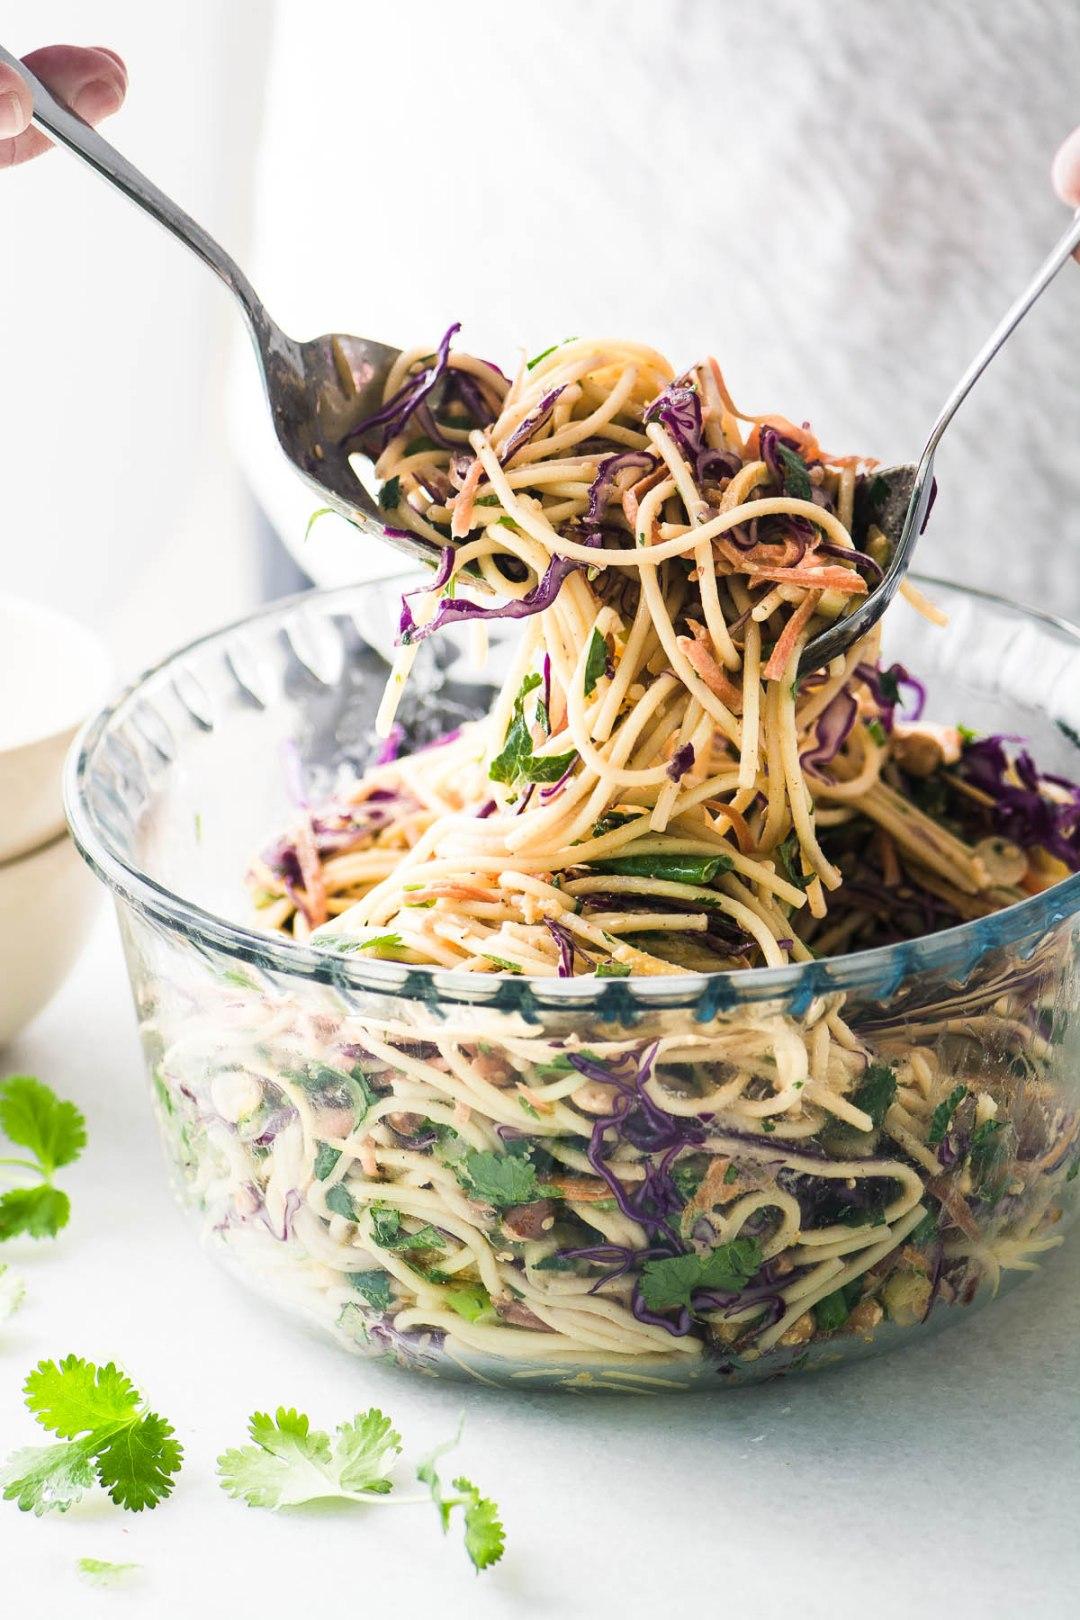 Toassing a spicy Thai spaghetti salad